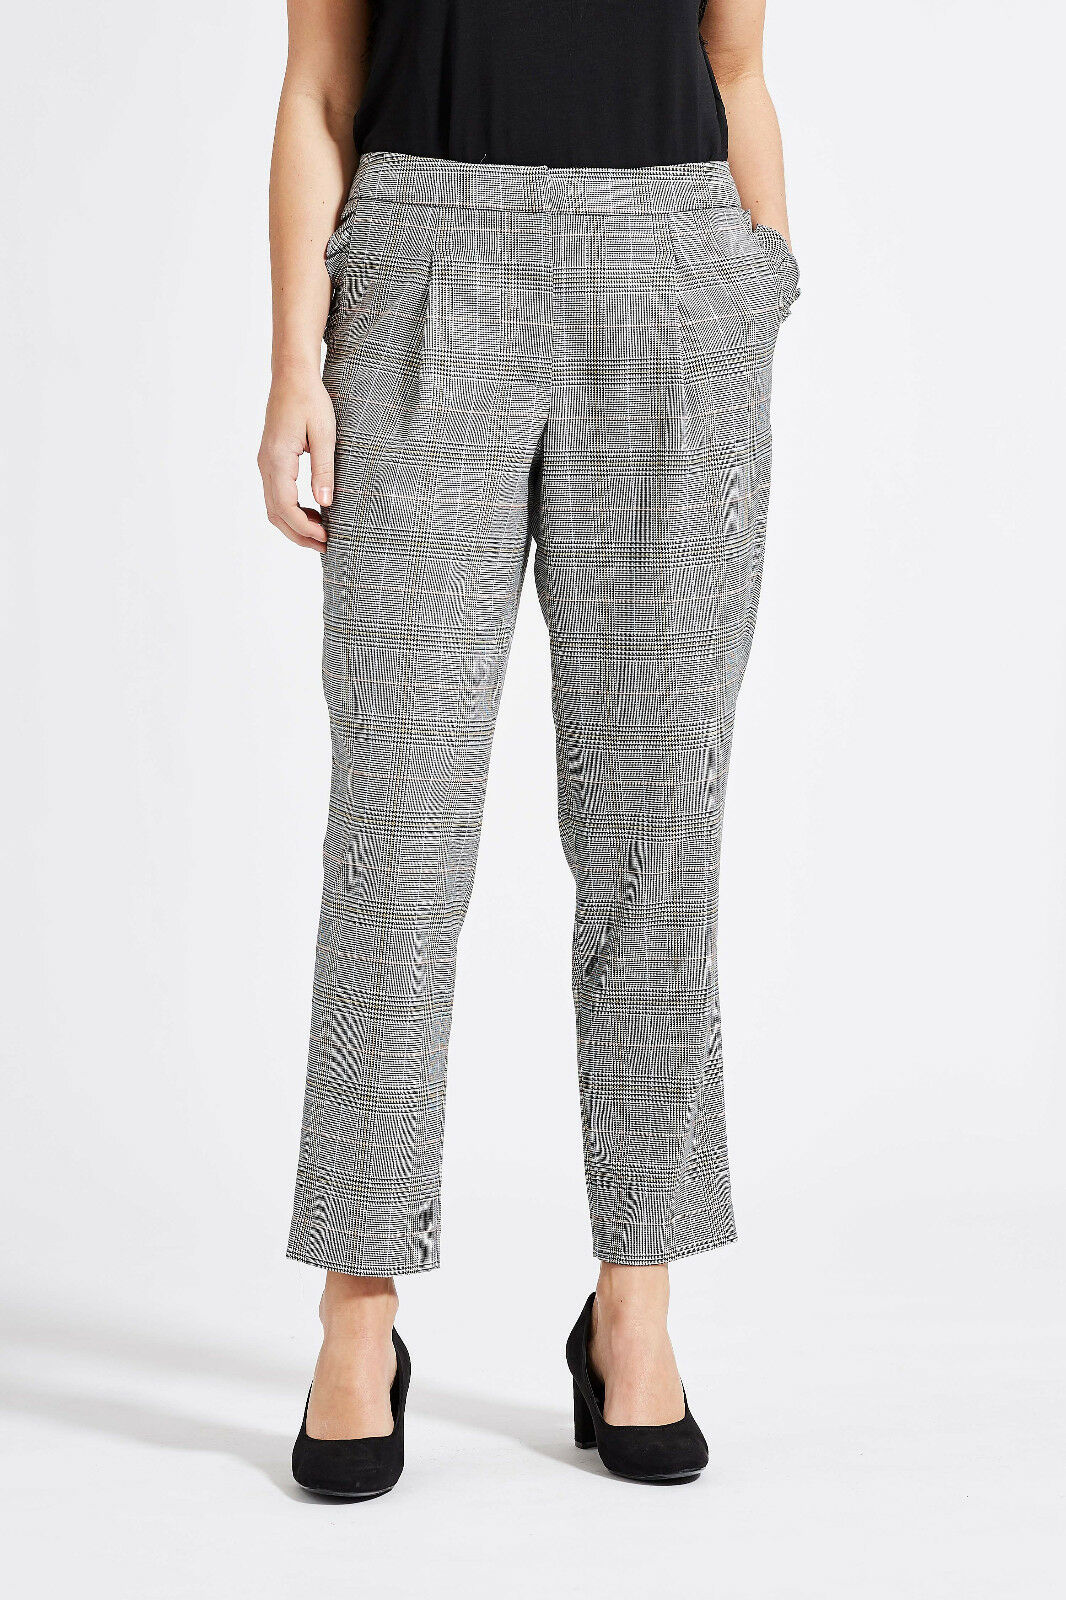 Laurie Trousers, Wide-cut, grau check, Ruffle Trim, Größe 42